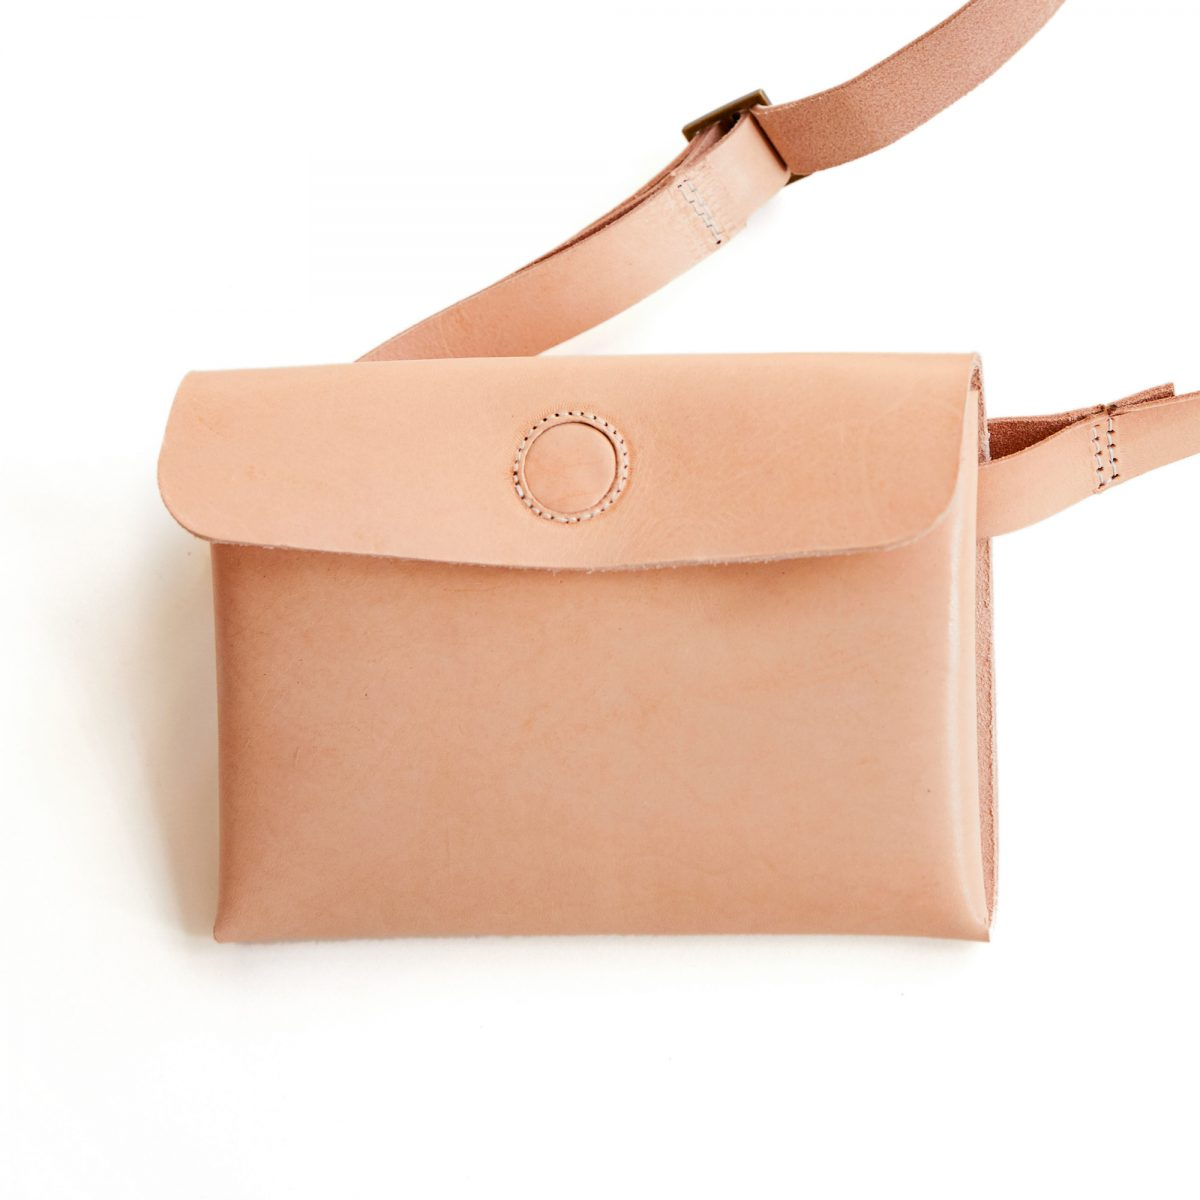 Clutch or small bag by Studio Rosanne Bergsma